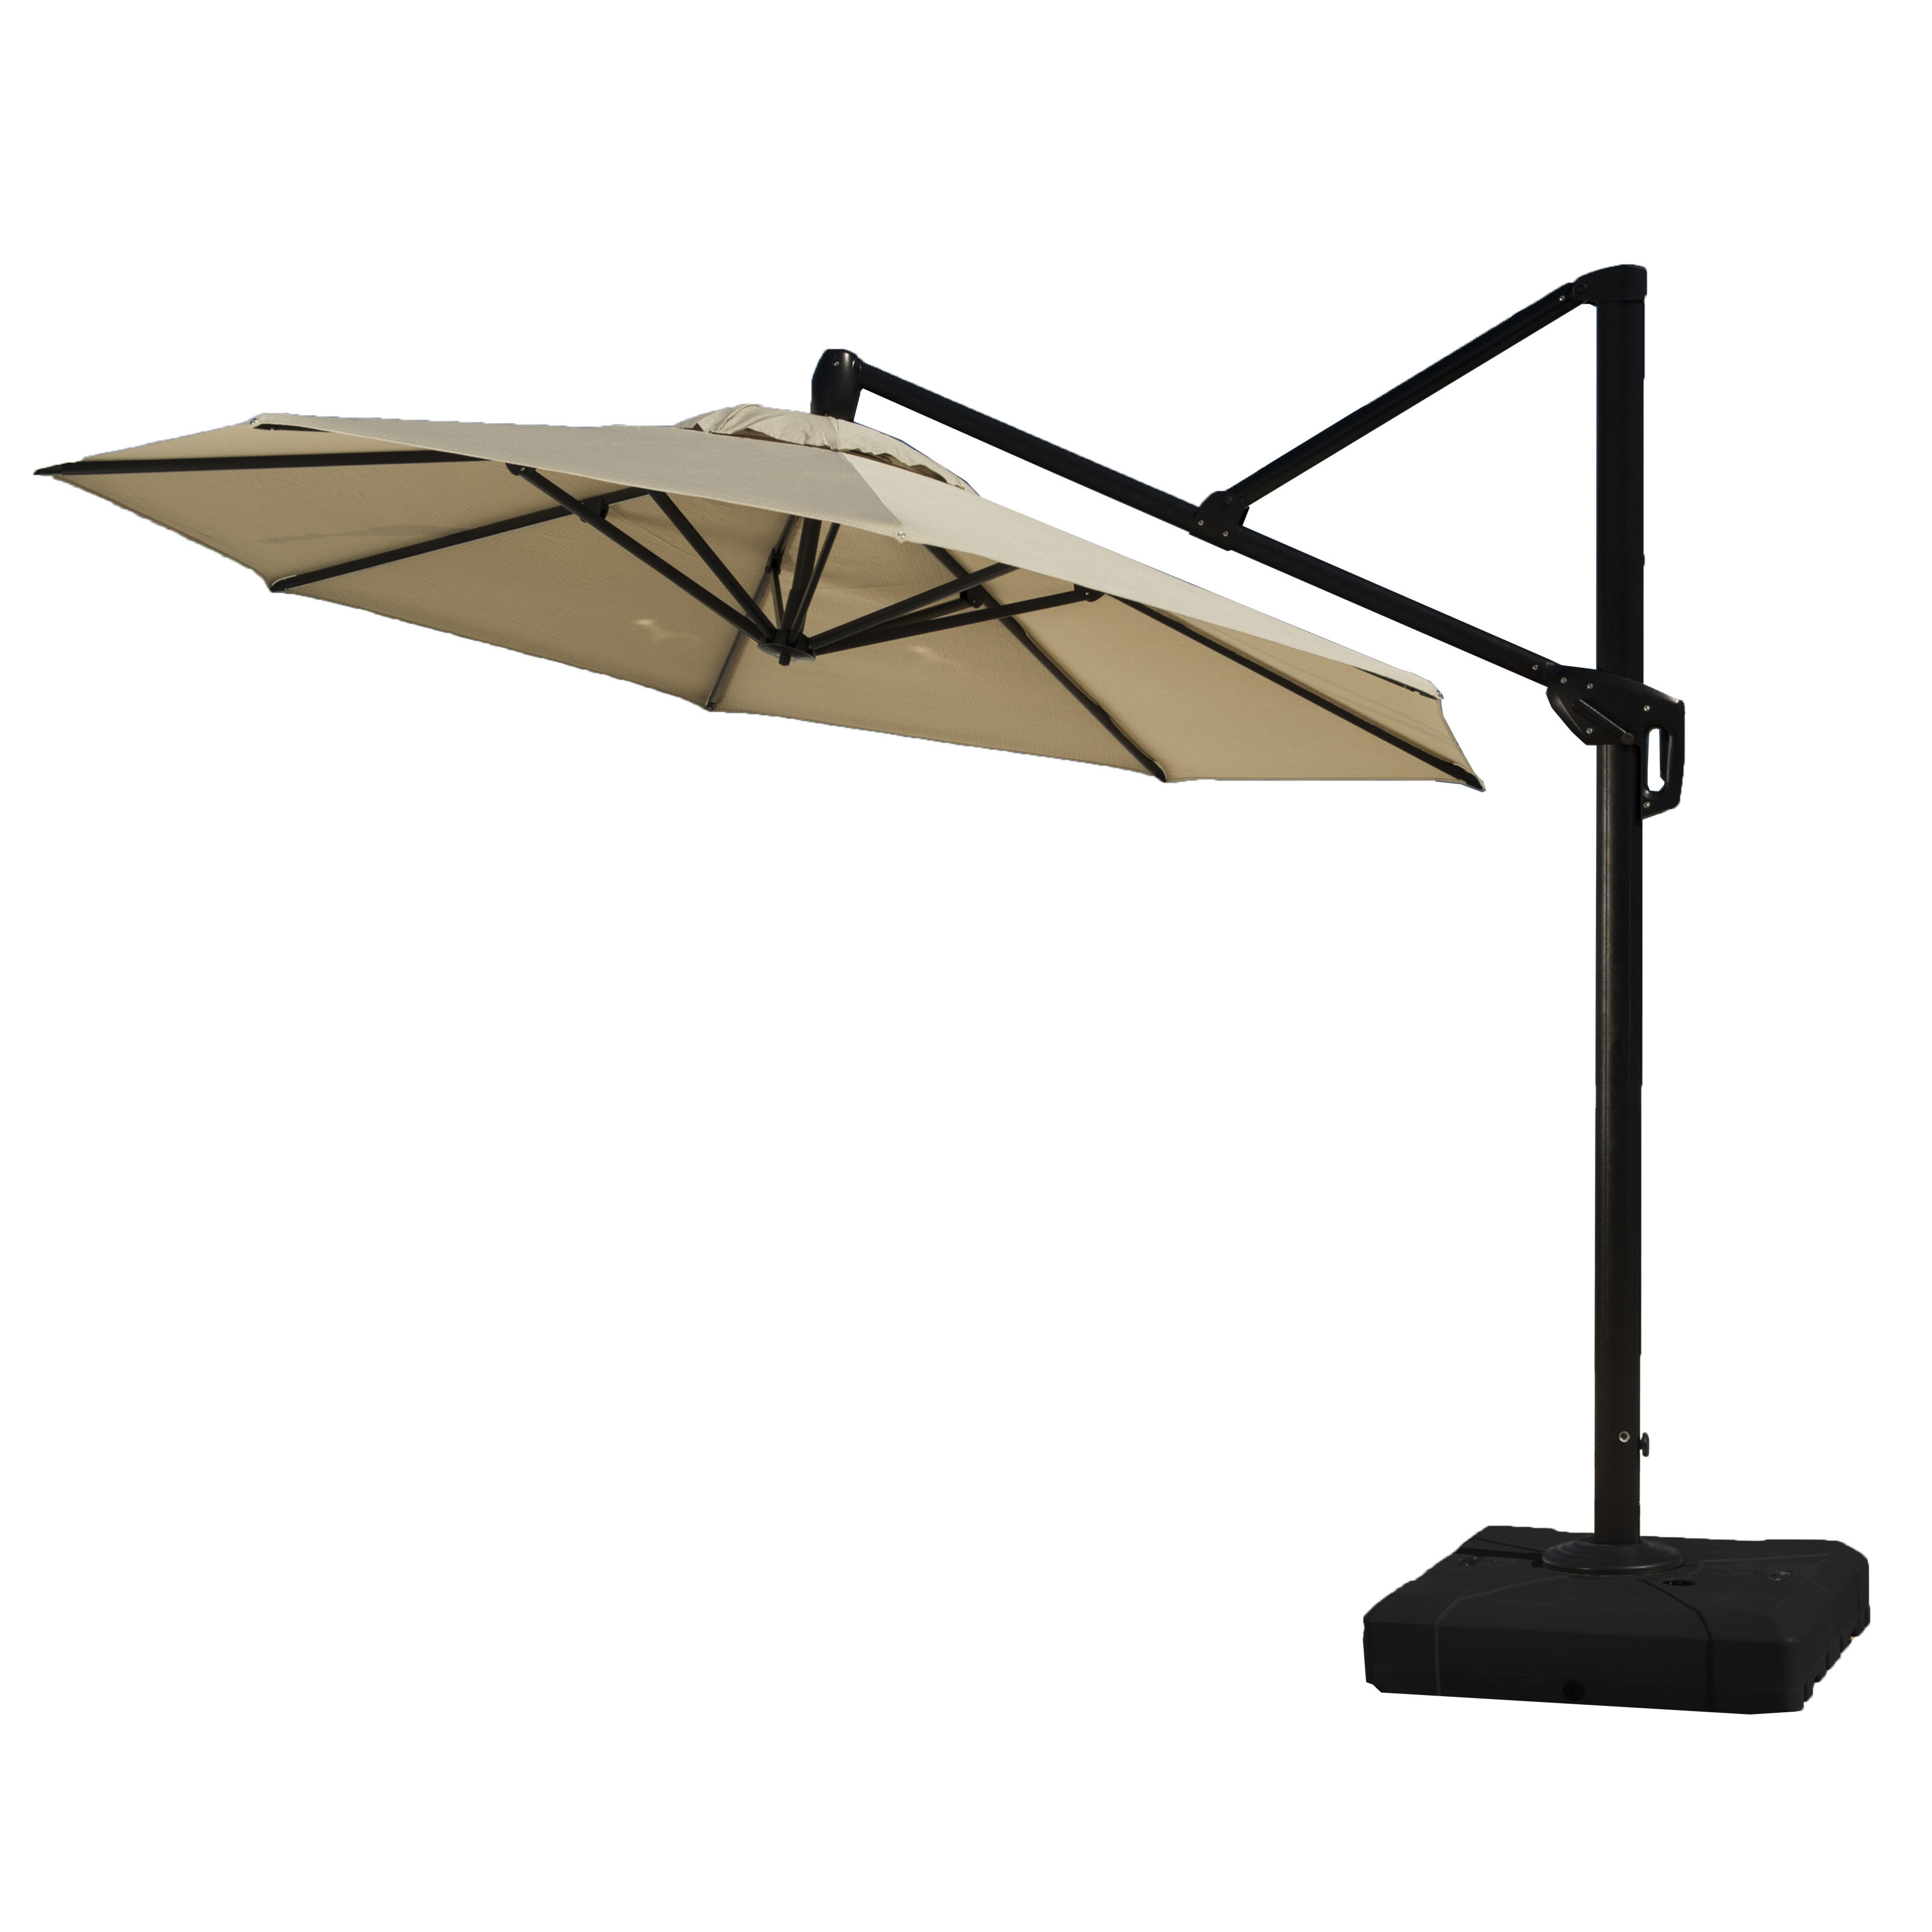 Sol 72 Outdoor Ceylon 10' Cantilever Sunbrella Umbrella Pertaining To Favorite Lennie Cantilever Sunbrella Umbrellas (View 7 of 20)